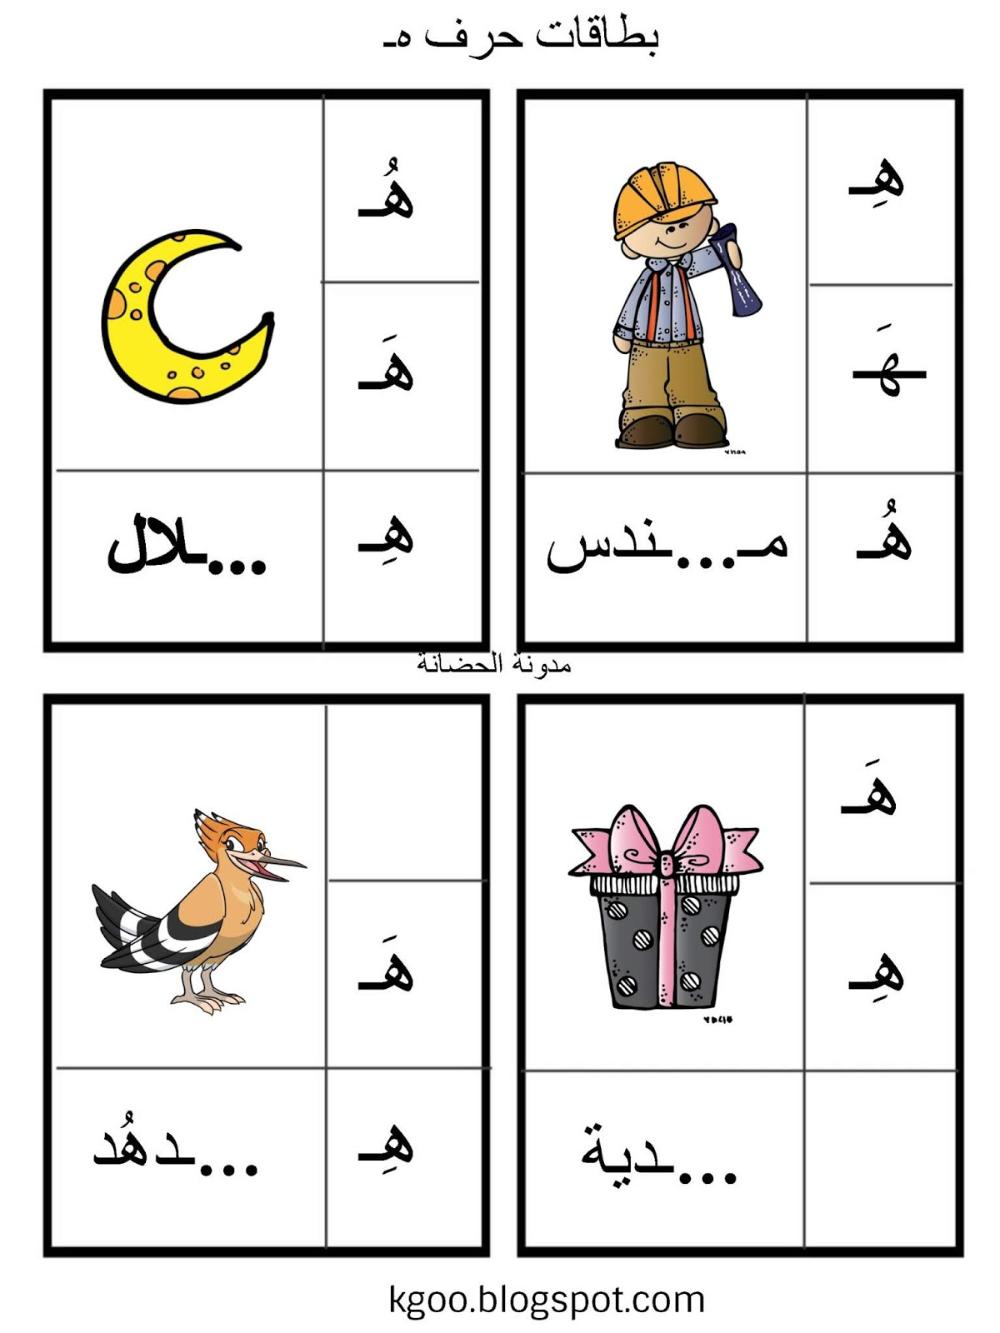 Kgoo Blogspot Com Google Search Arabic Alphabet For Kids Arabic Alphabet Alphabet For Kids